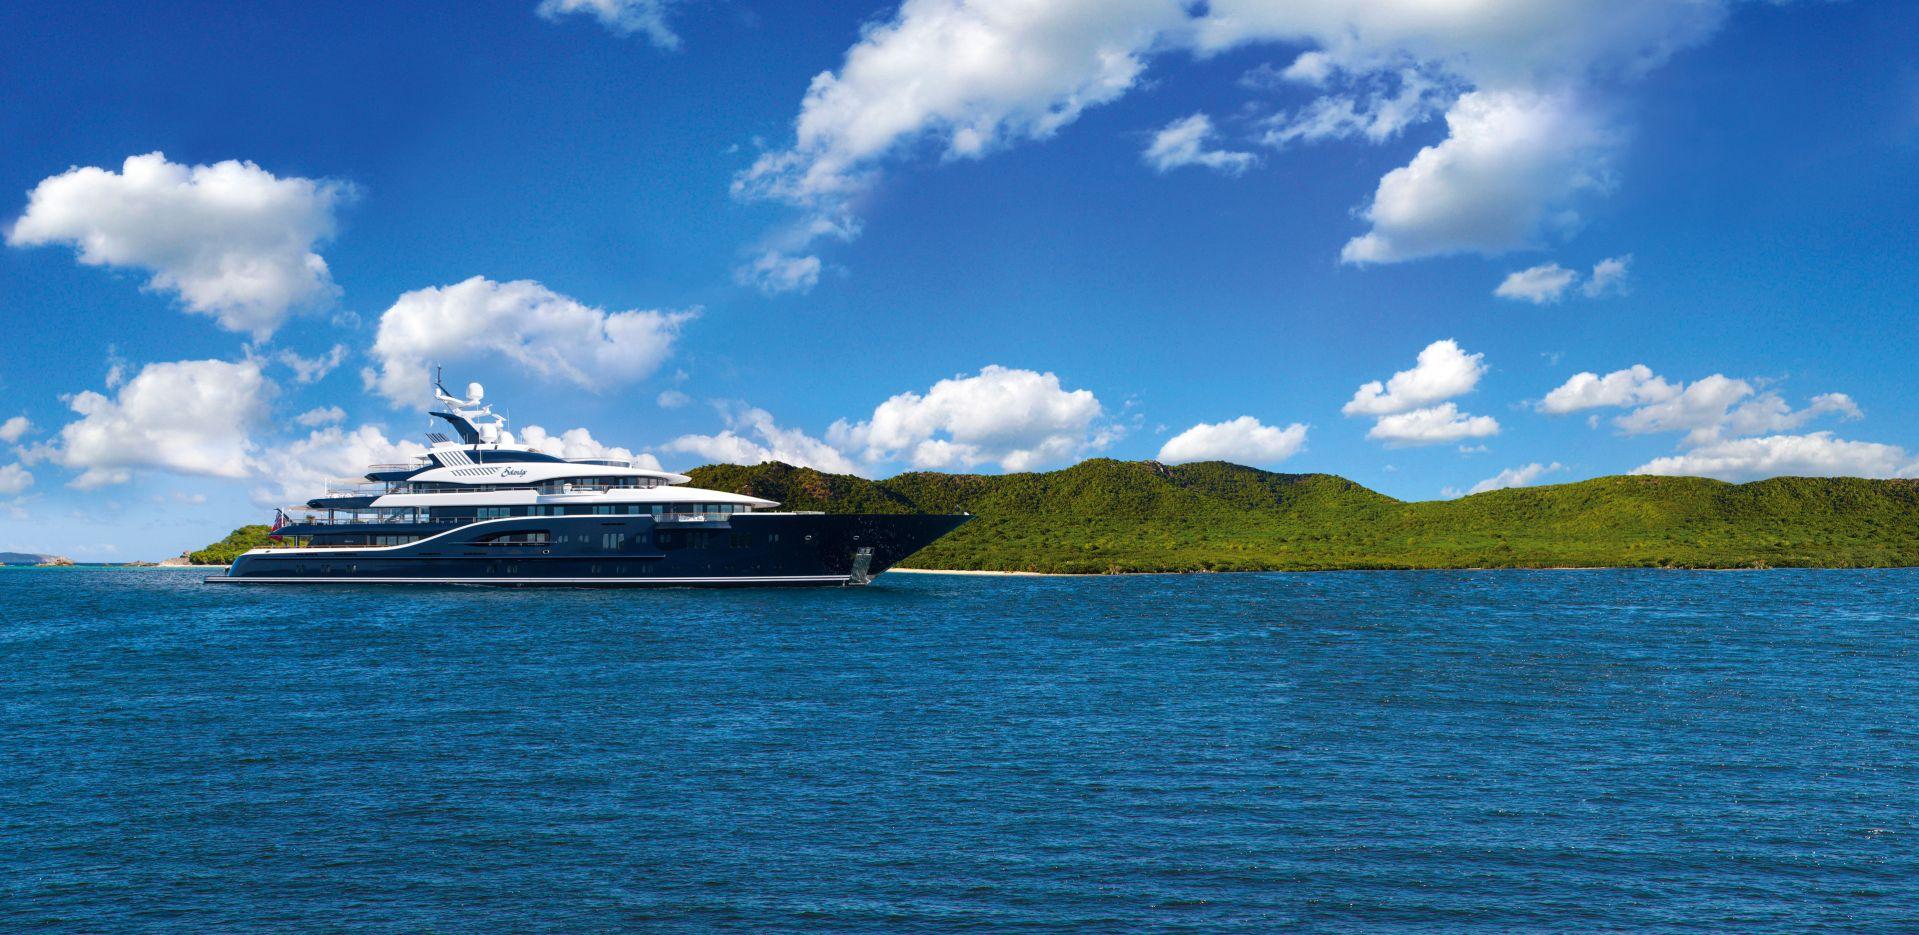 Yacht Solandge Running In The Caribben